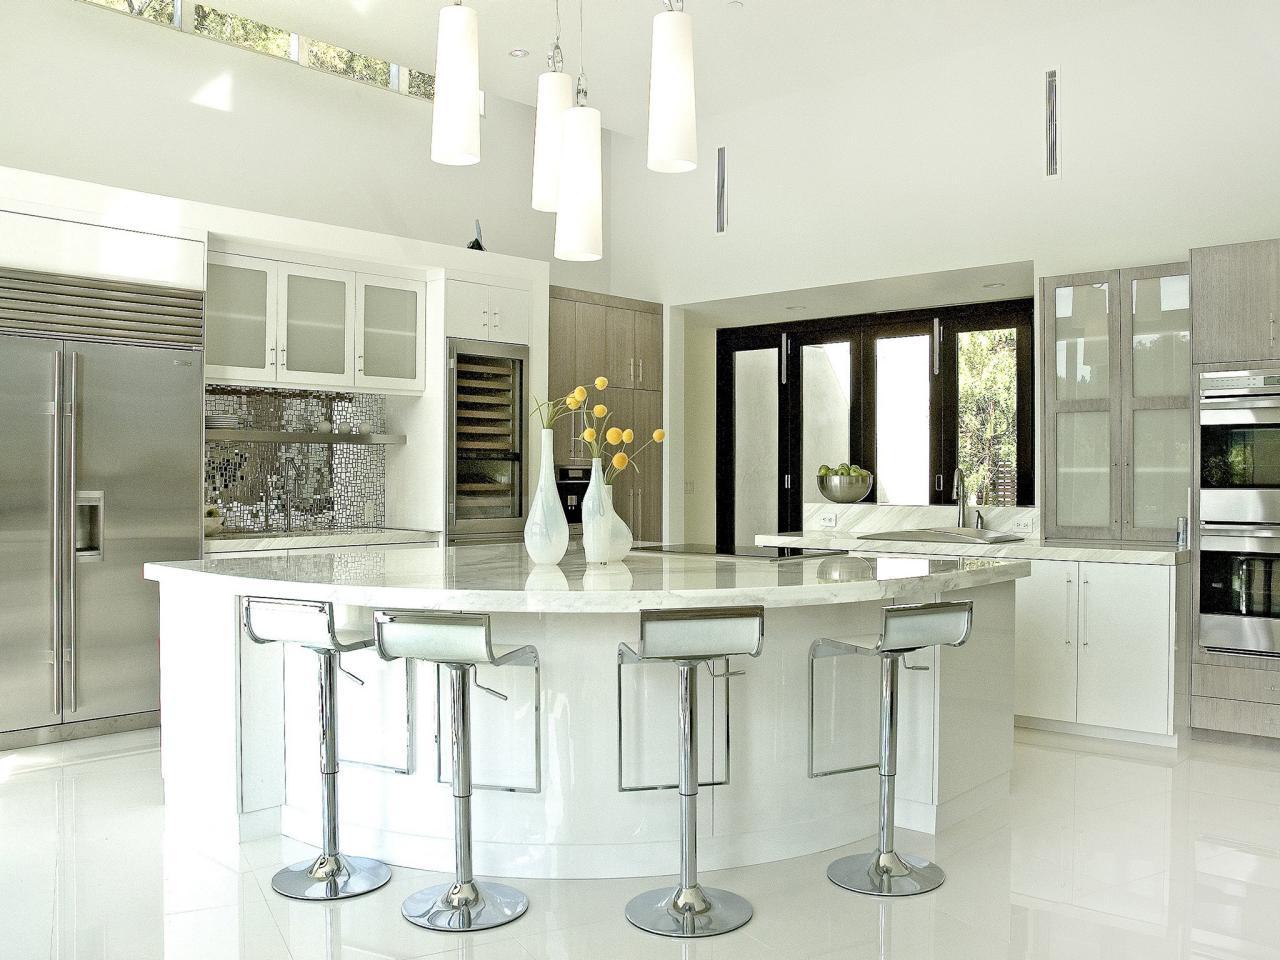 granite kitchen countertops: pictures & ideas from hgtv | hgtv